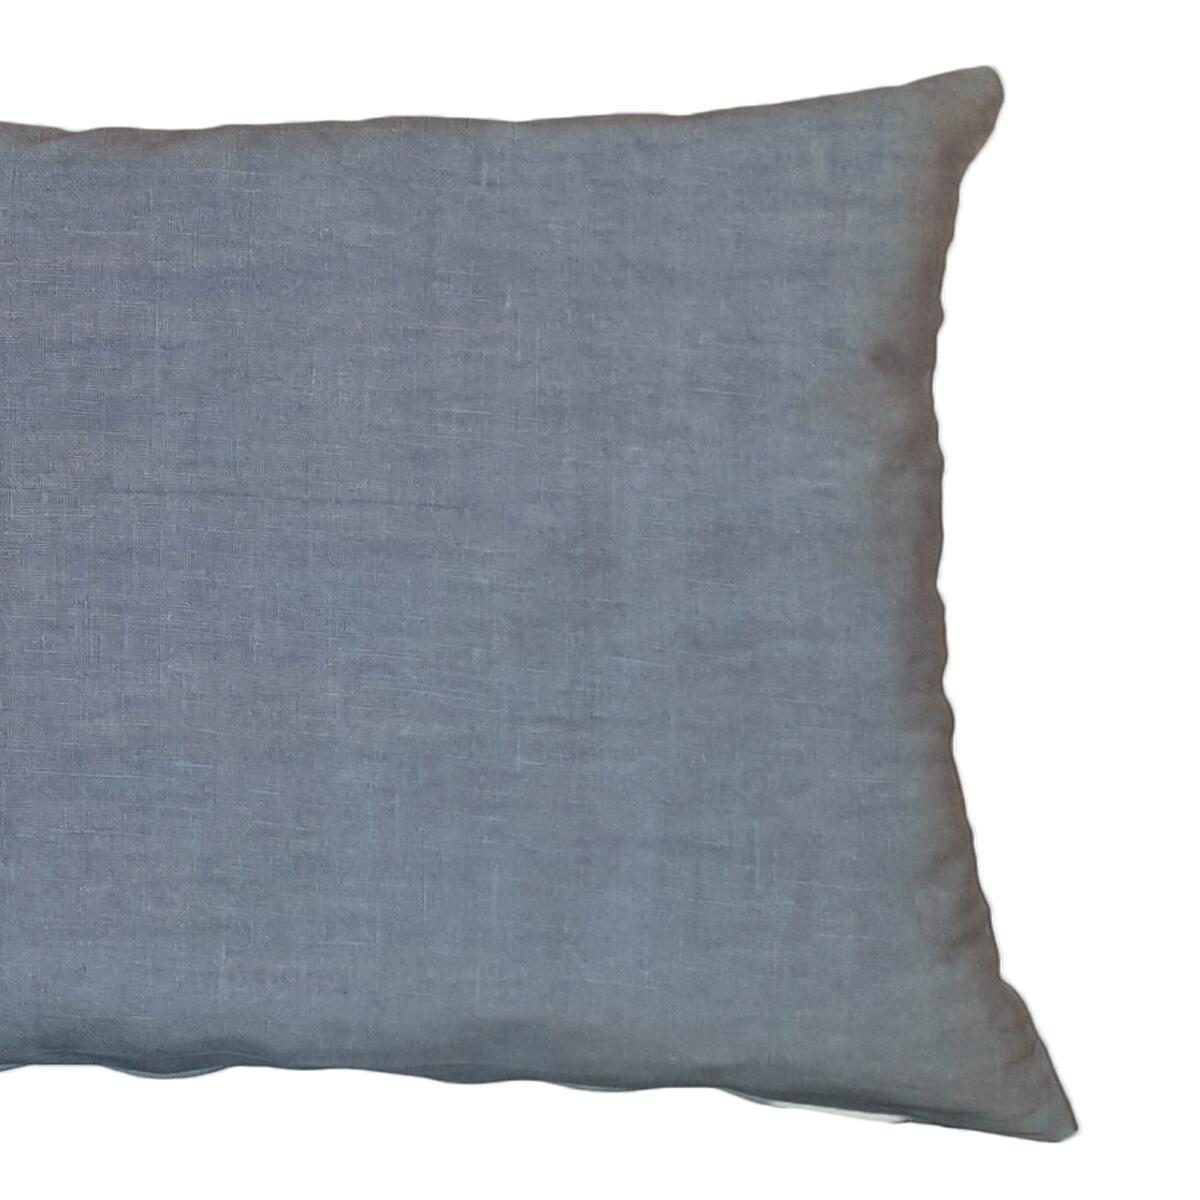 Cuscino Lino viola 40x60 cm - 2